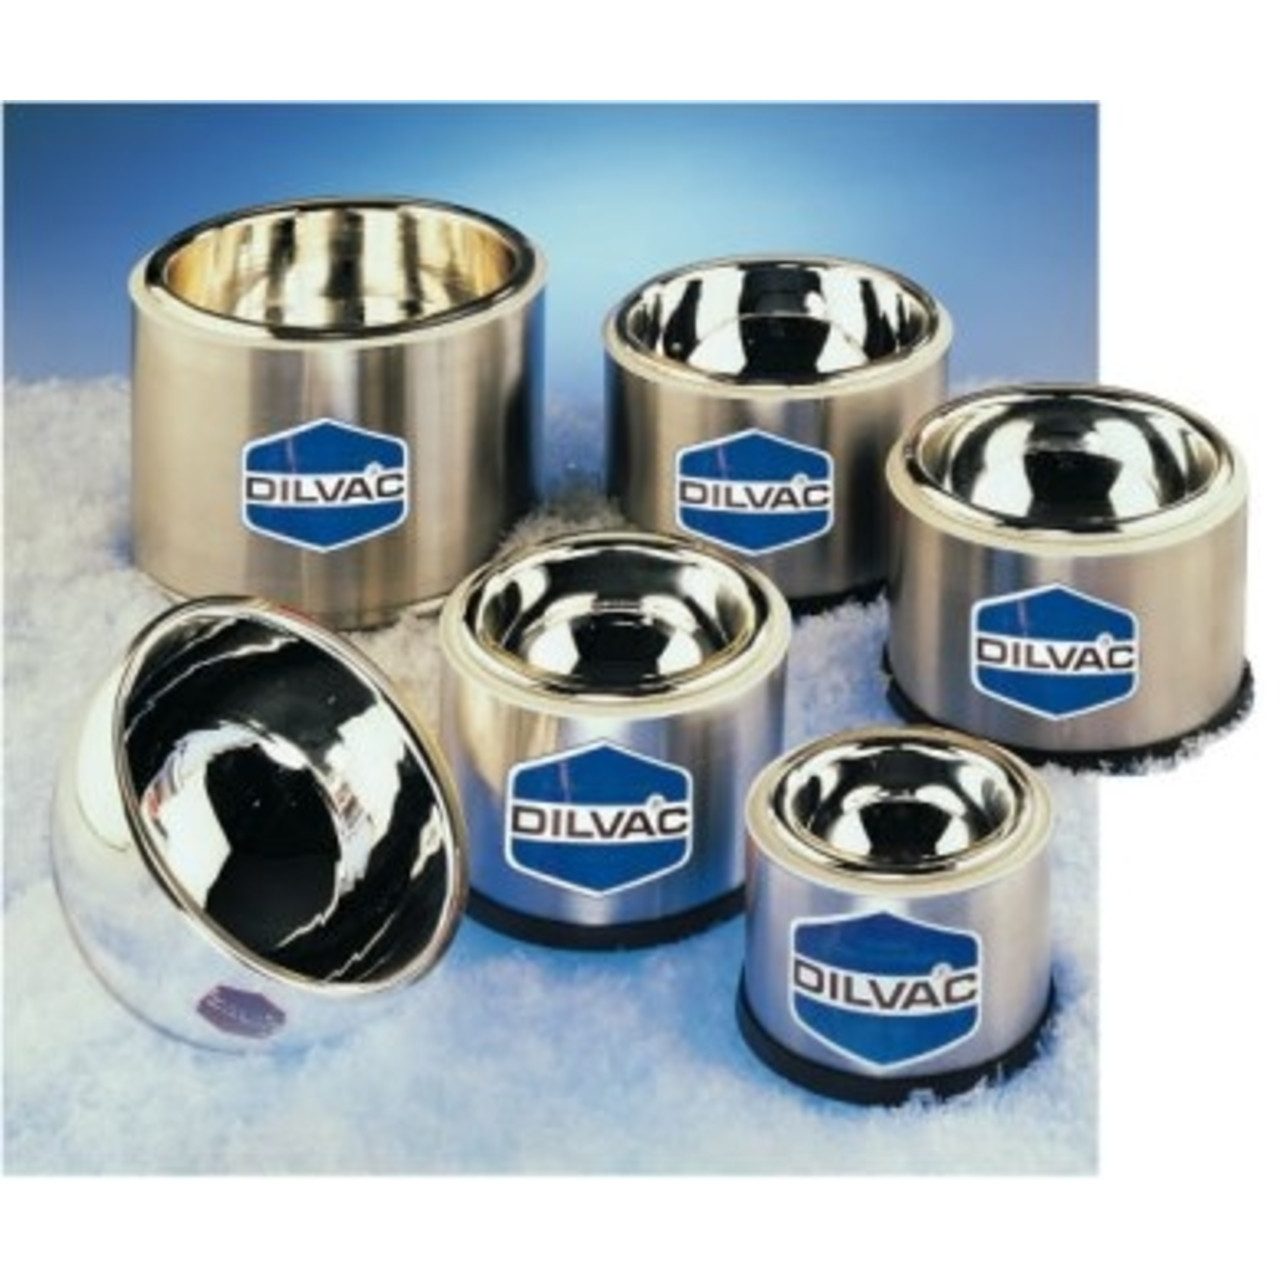 Scilogex WideTop-Shallow Stainless Steel Cased Dewar Flask - 0.57L